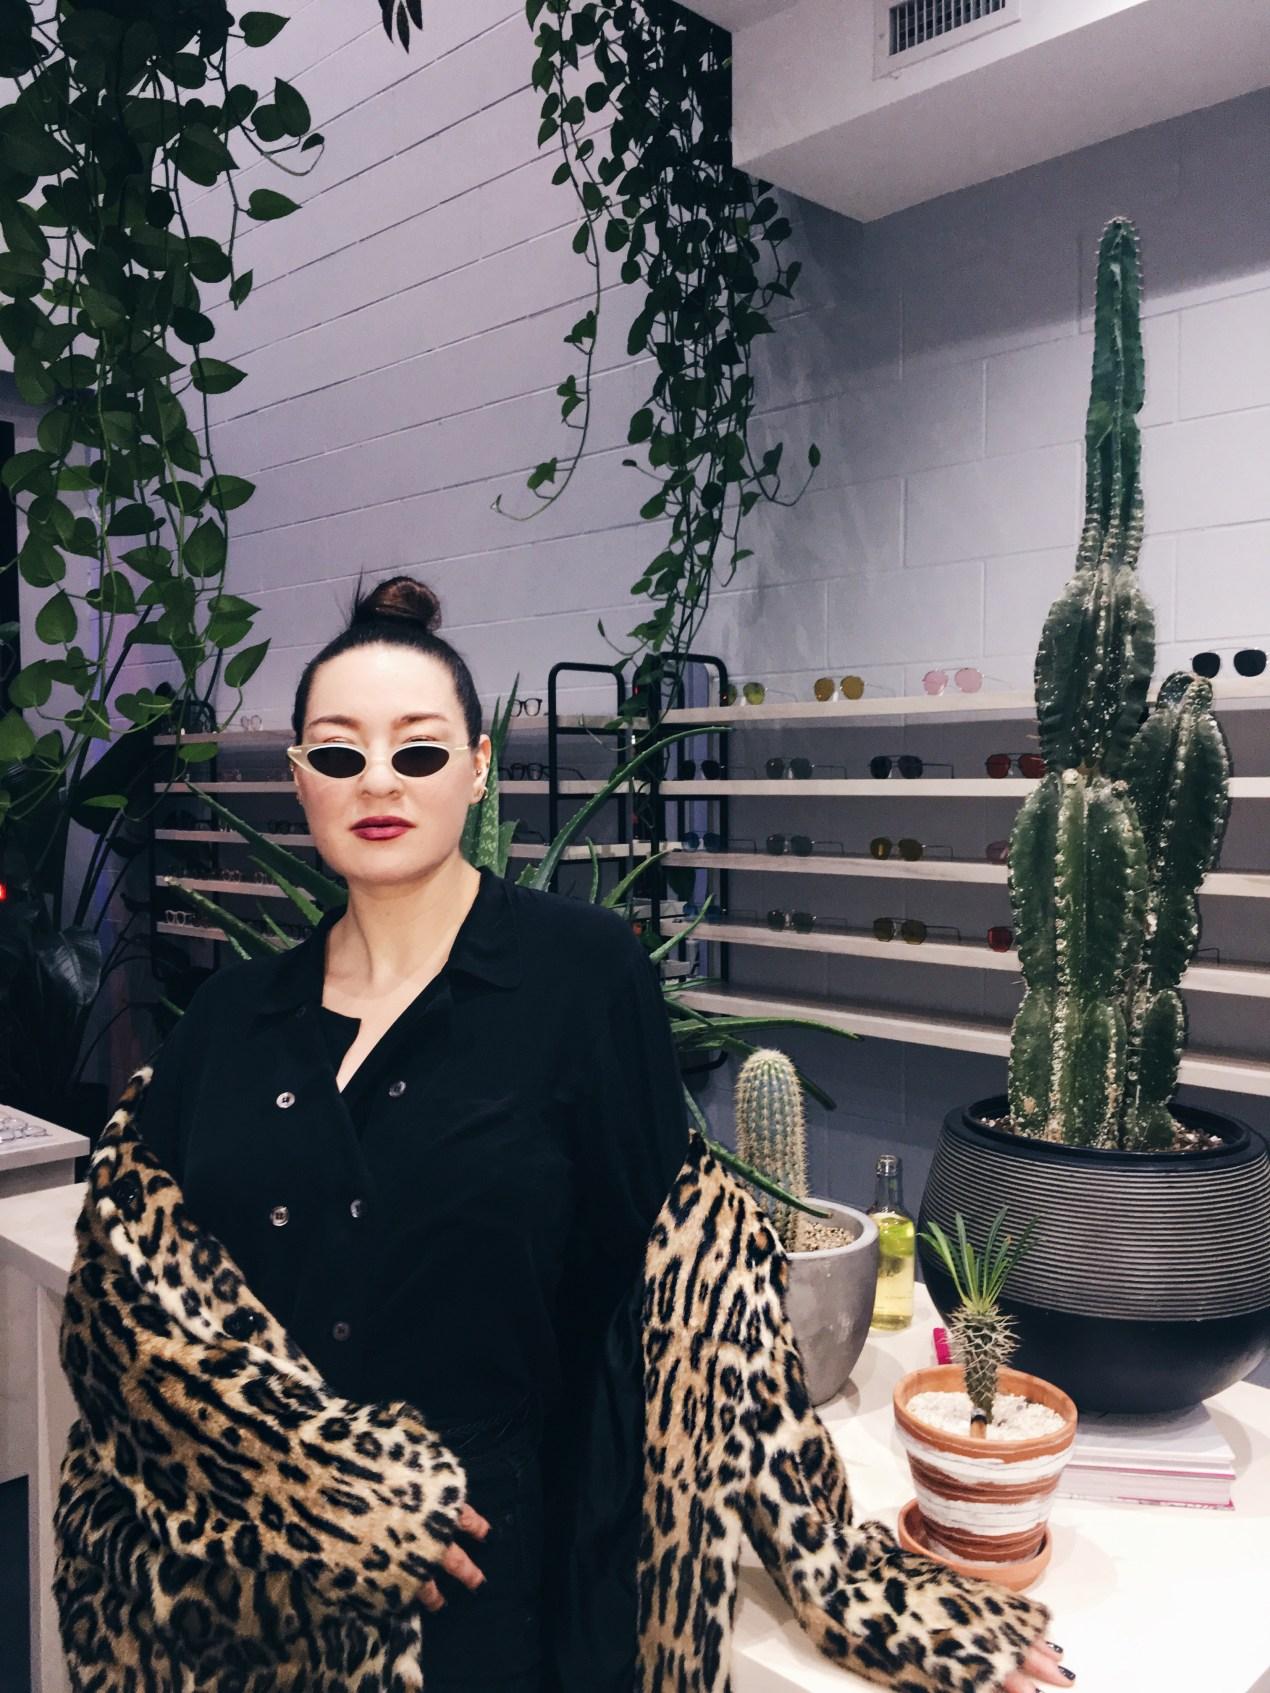 Trashy vs. Classy Leopard Print | The Lady-like Leopard by Melina Morry